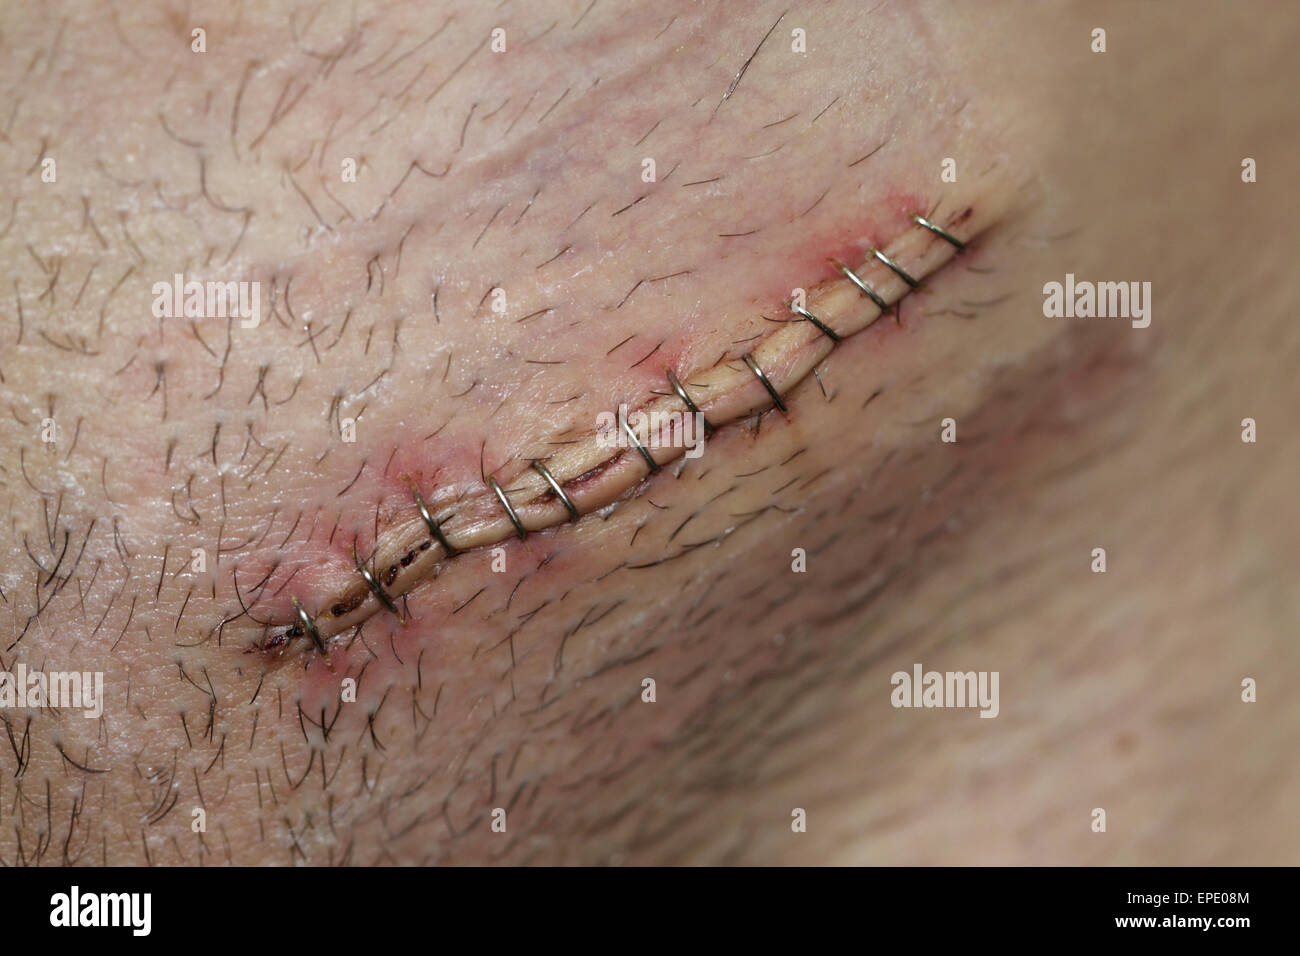 Incision chirurgicale hernie inguinale postopératoire Banque D ...